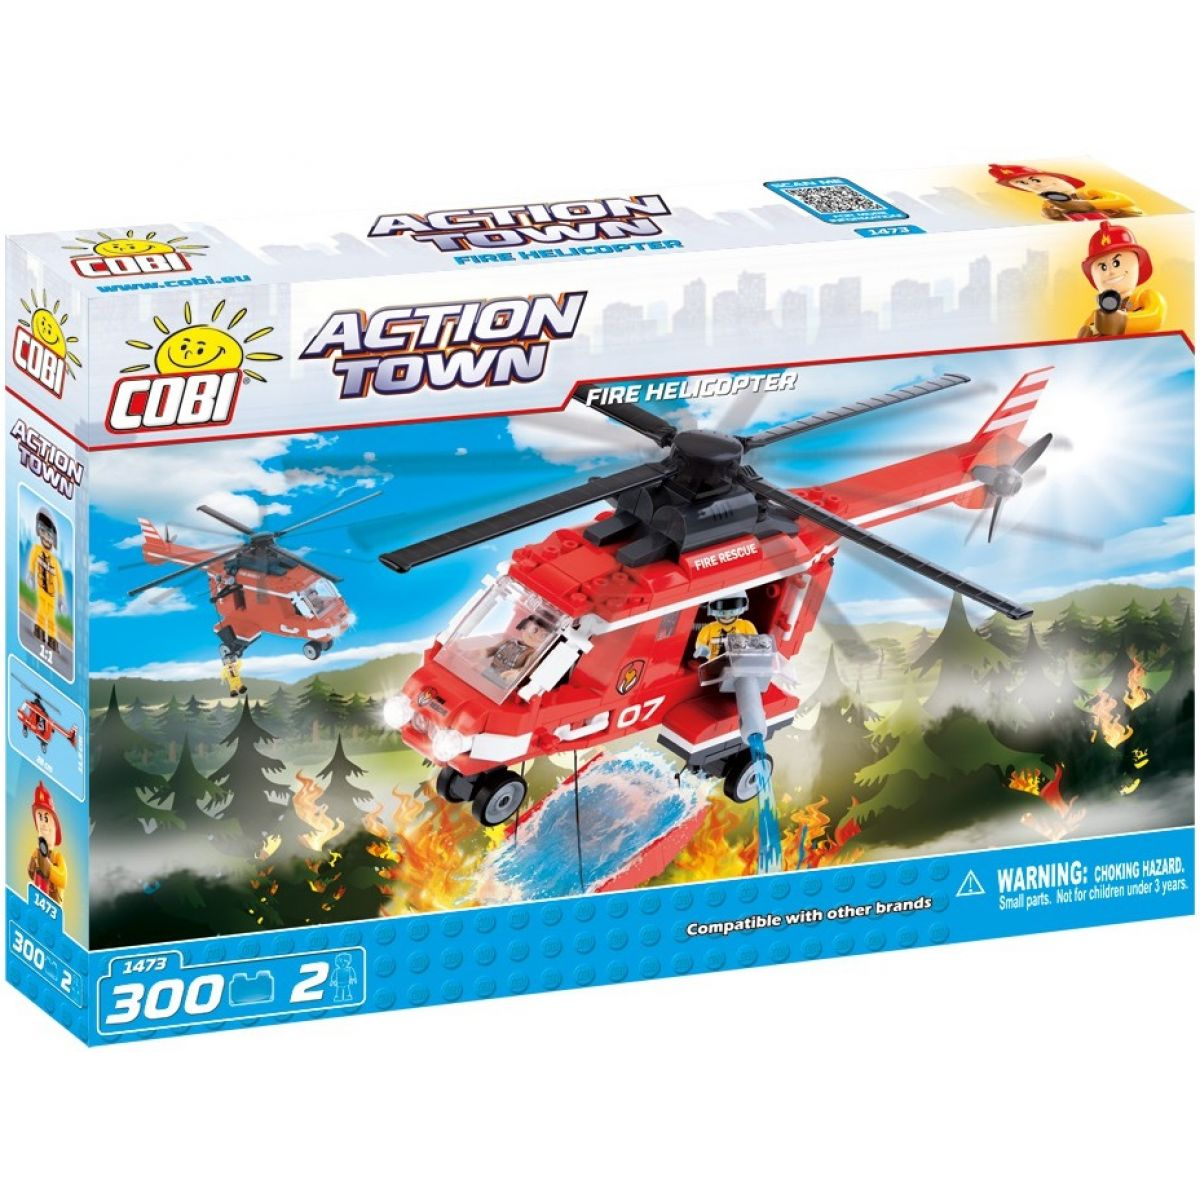 Cobi 1473 ACTION TOWN Hasičská helikoptéra